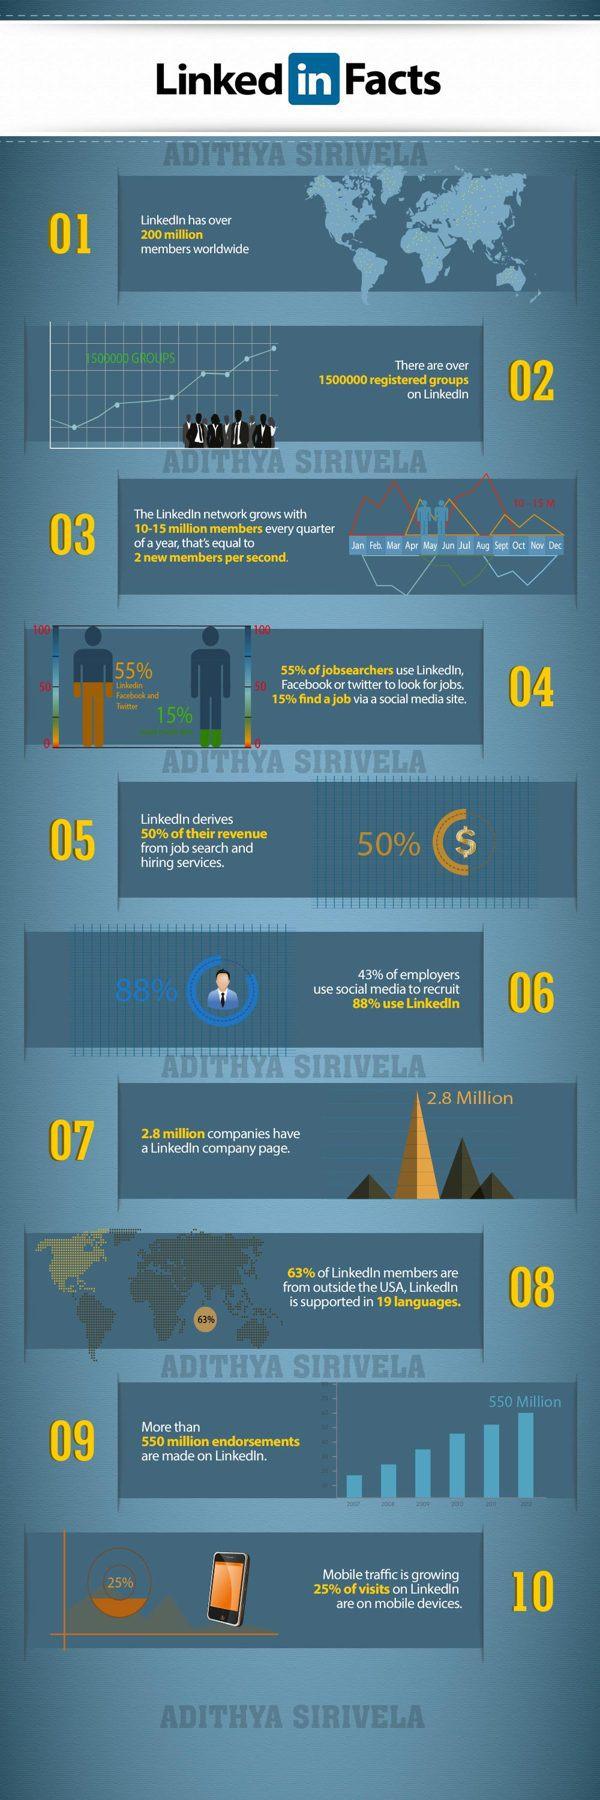 Linkedin facts #infografia #infographic #socialmedia